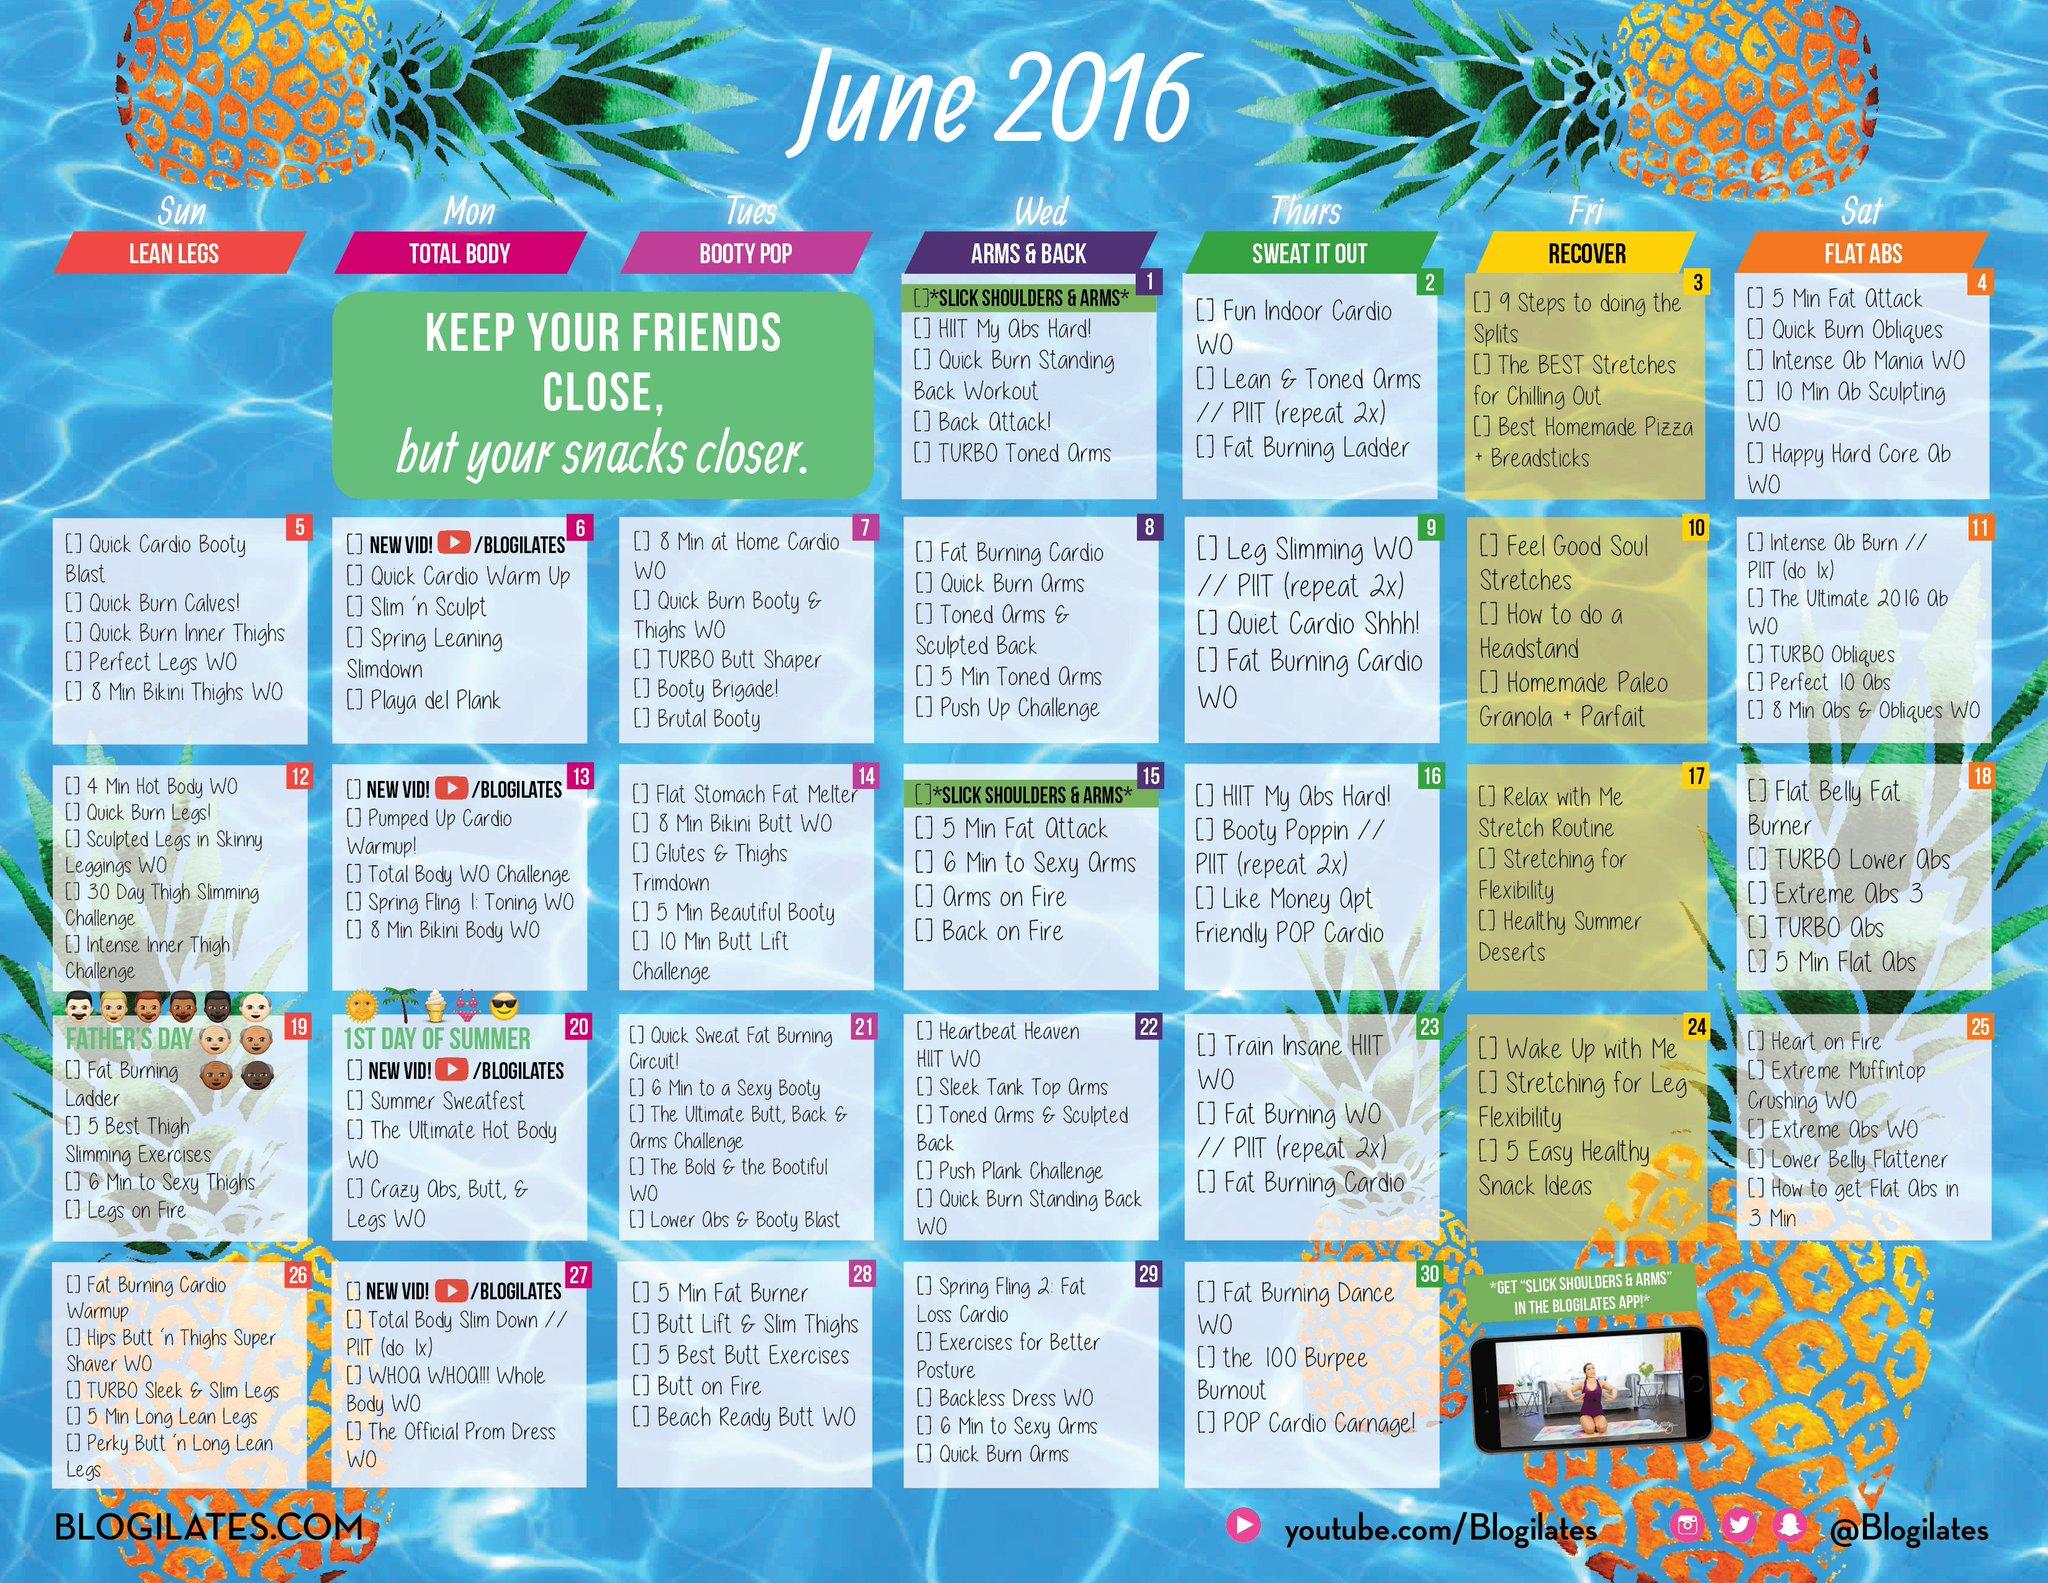 June Calendar Ilates : Cassey ho on twitter quot who s doing the june